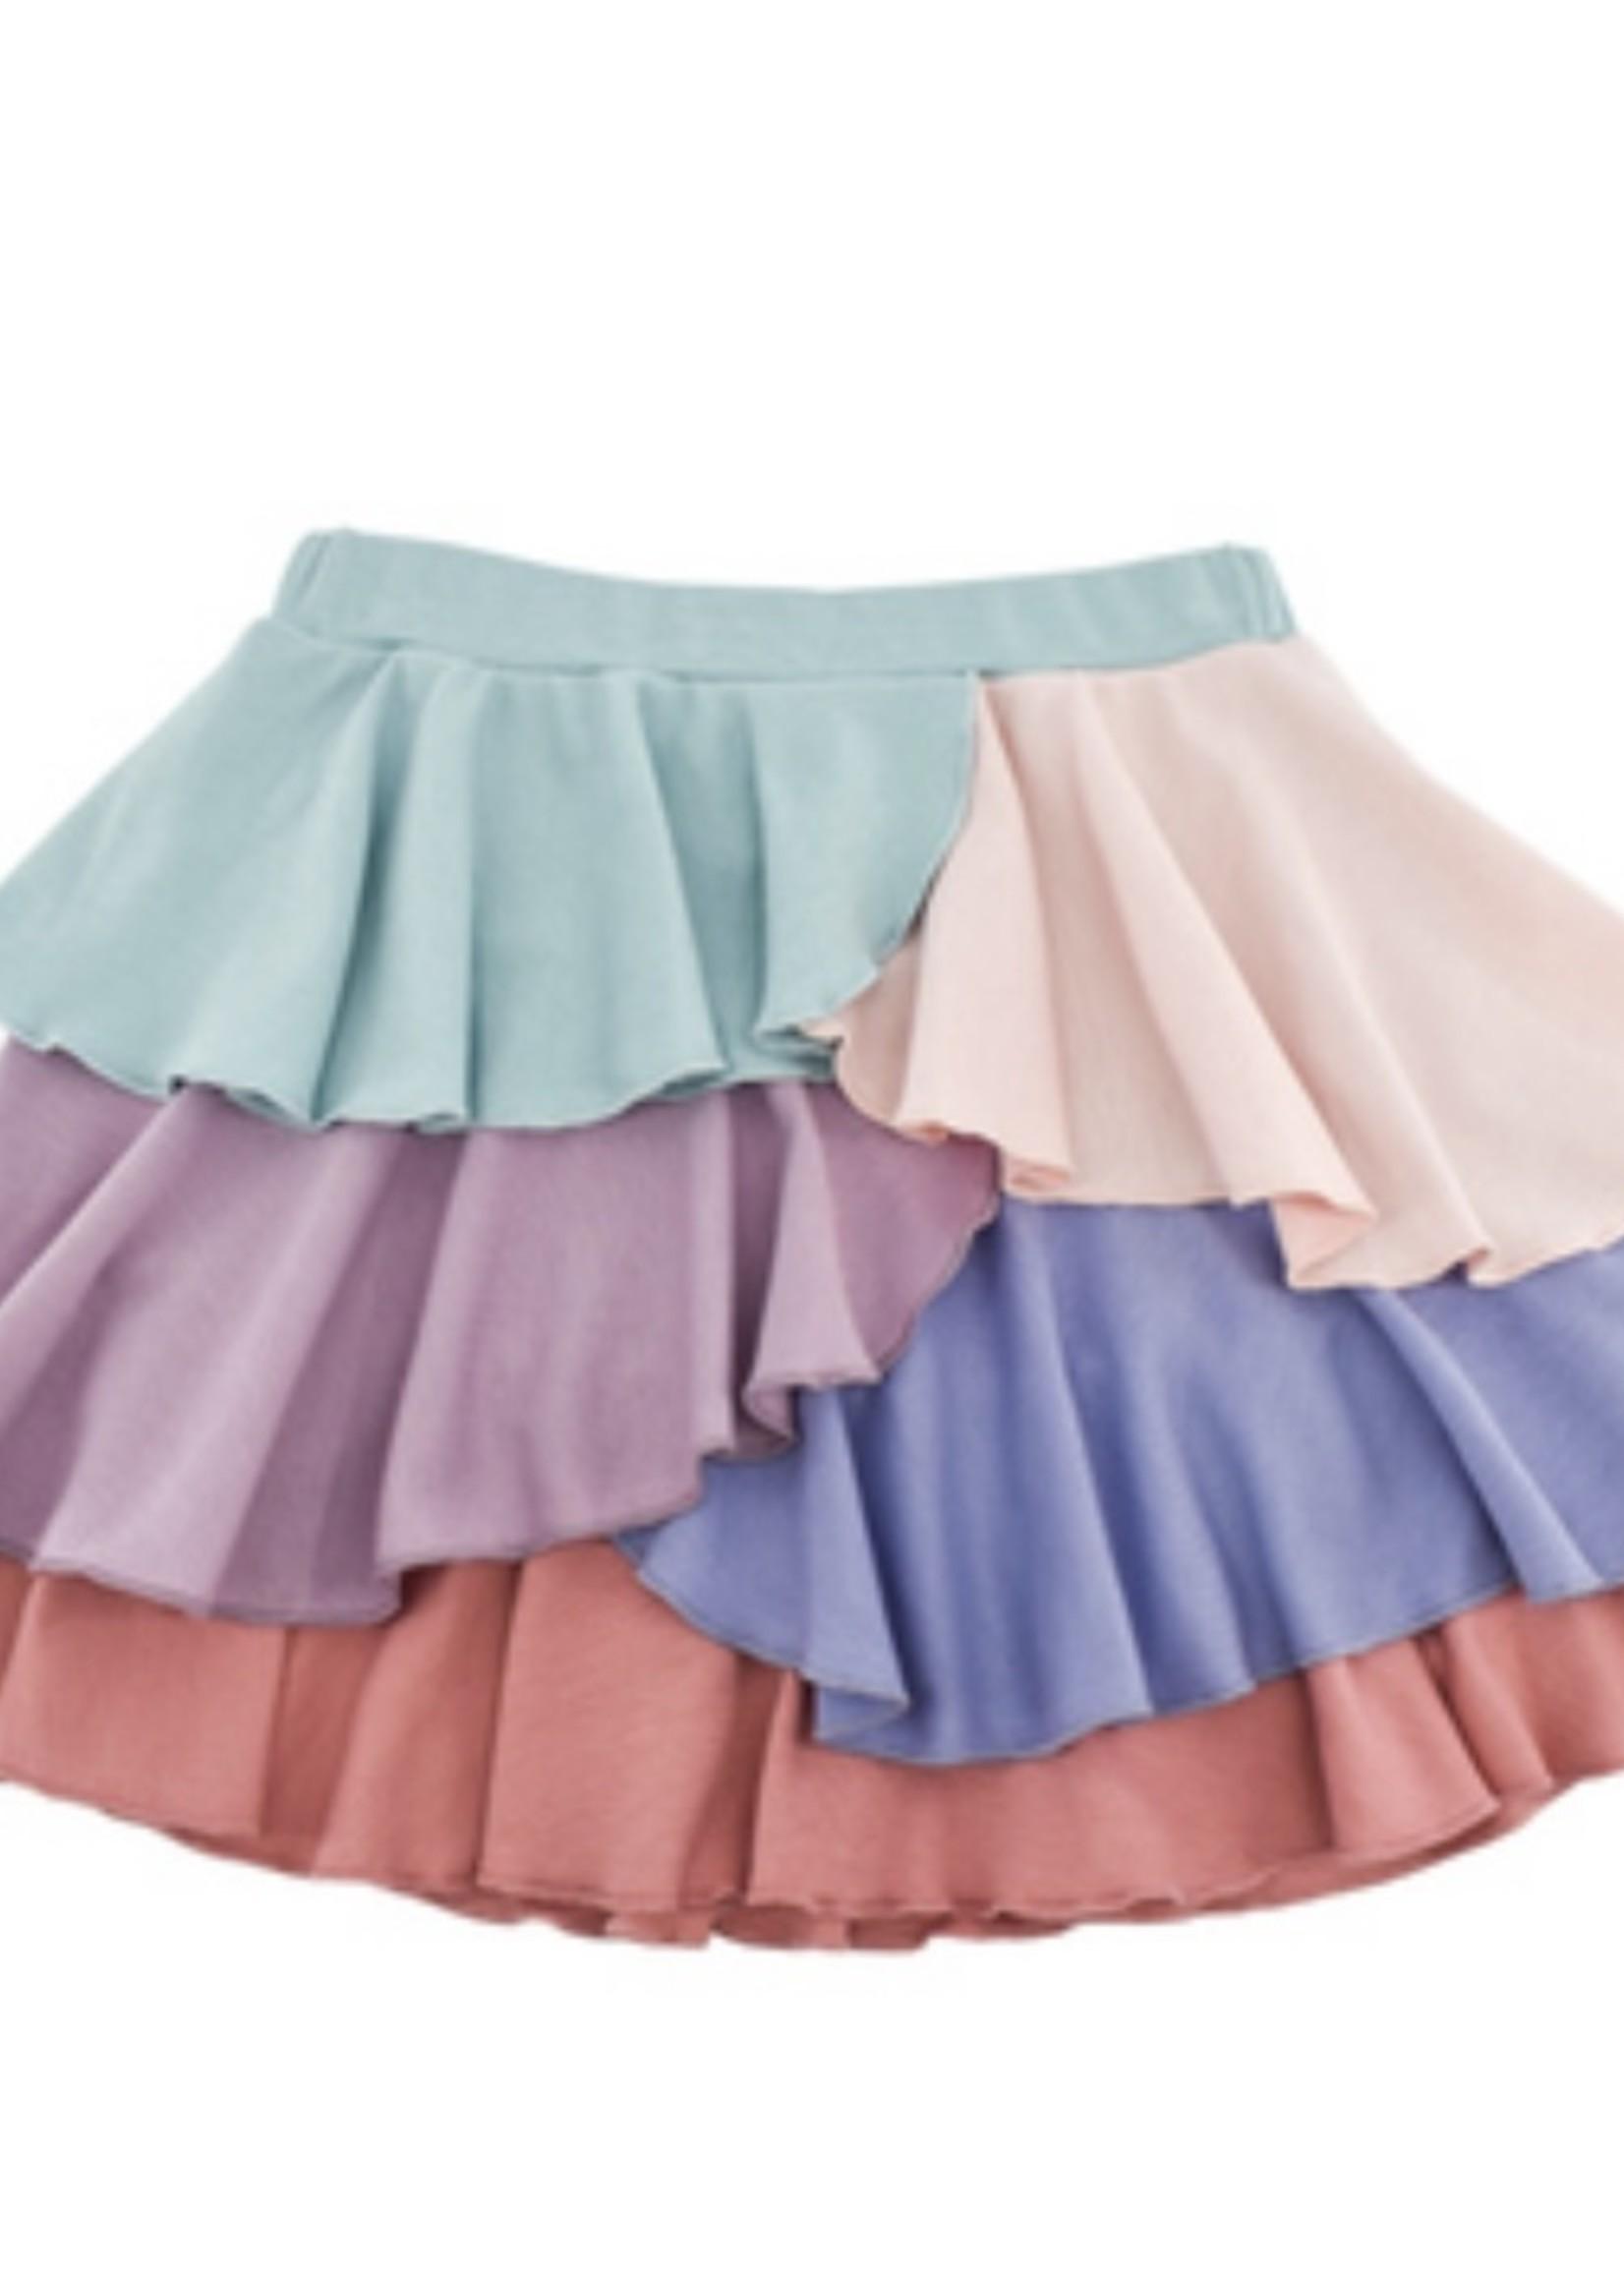 Ruffle Tiered Skirt - Multi